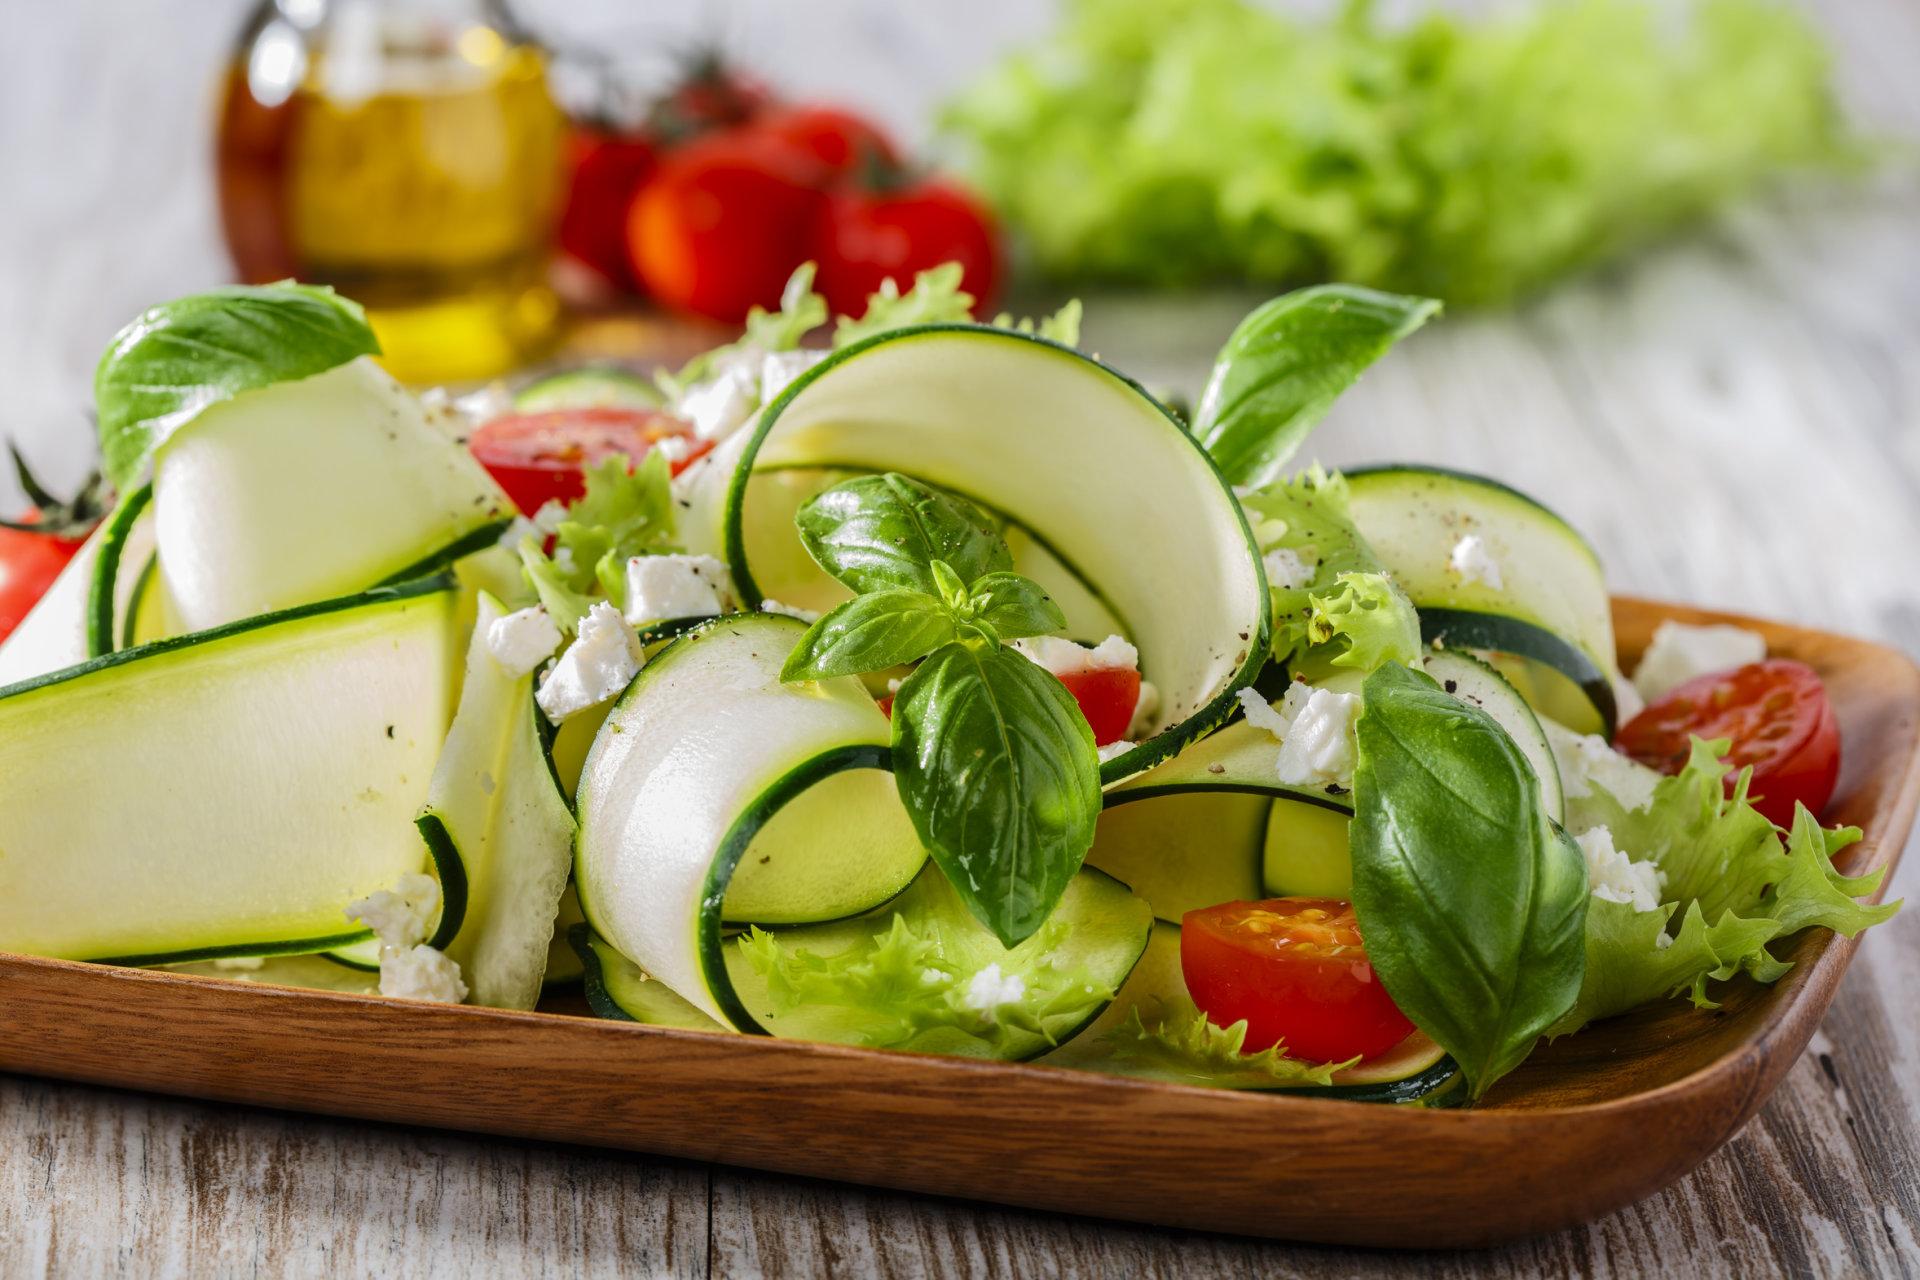 dieta sergant hipertenzija ir padidėjusiu cholesterolio kiekiu)